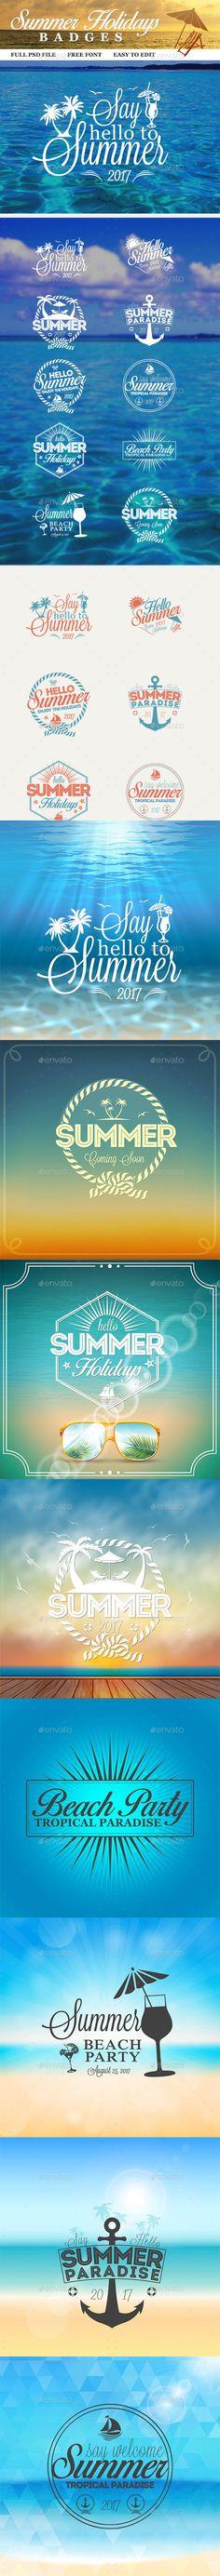 Summer Holidays Badges Templates PSD